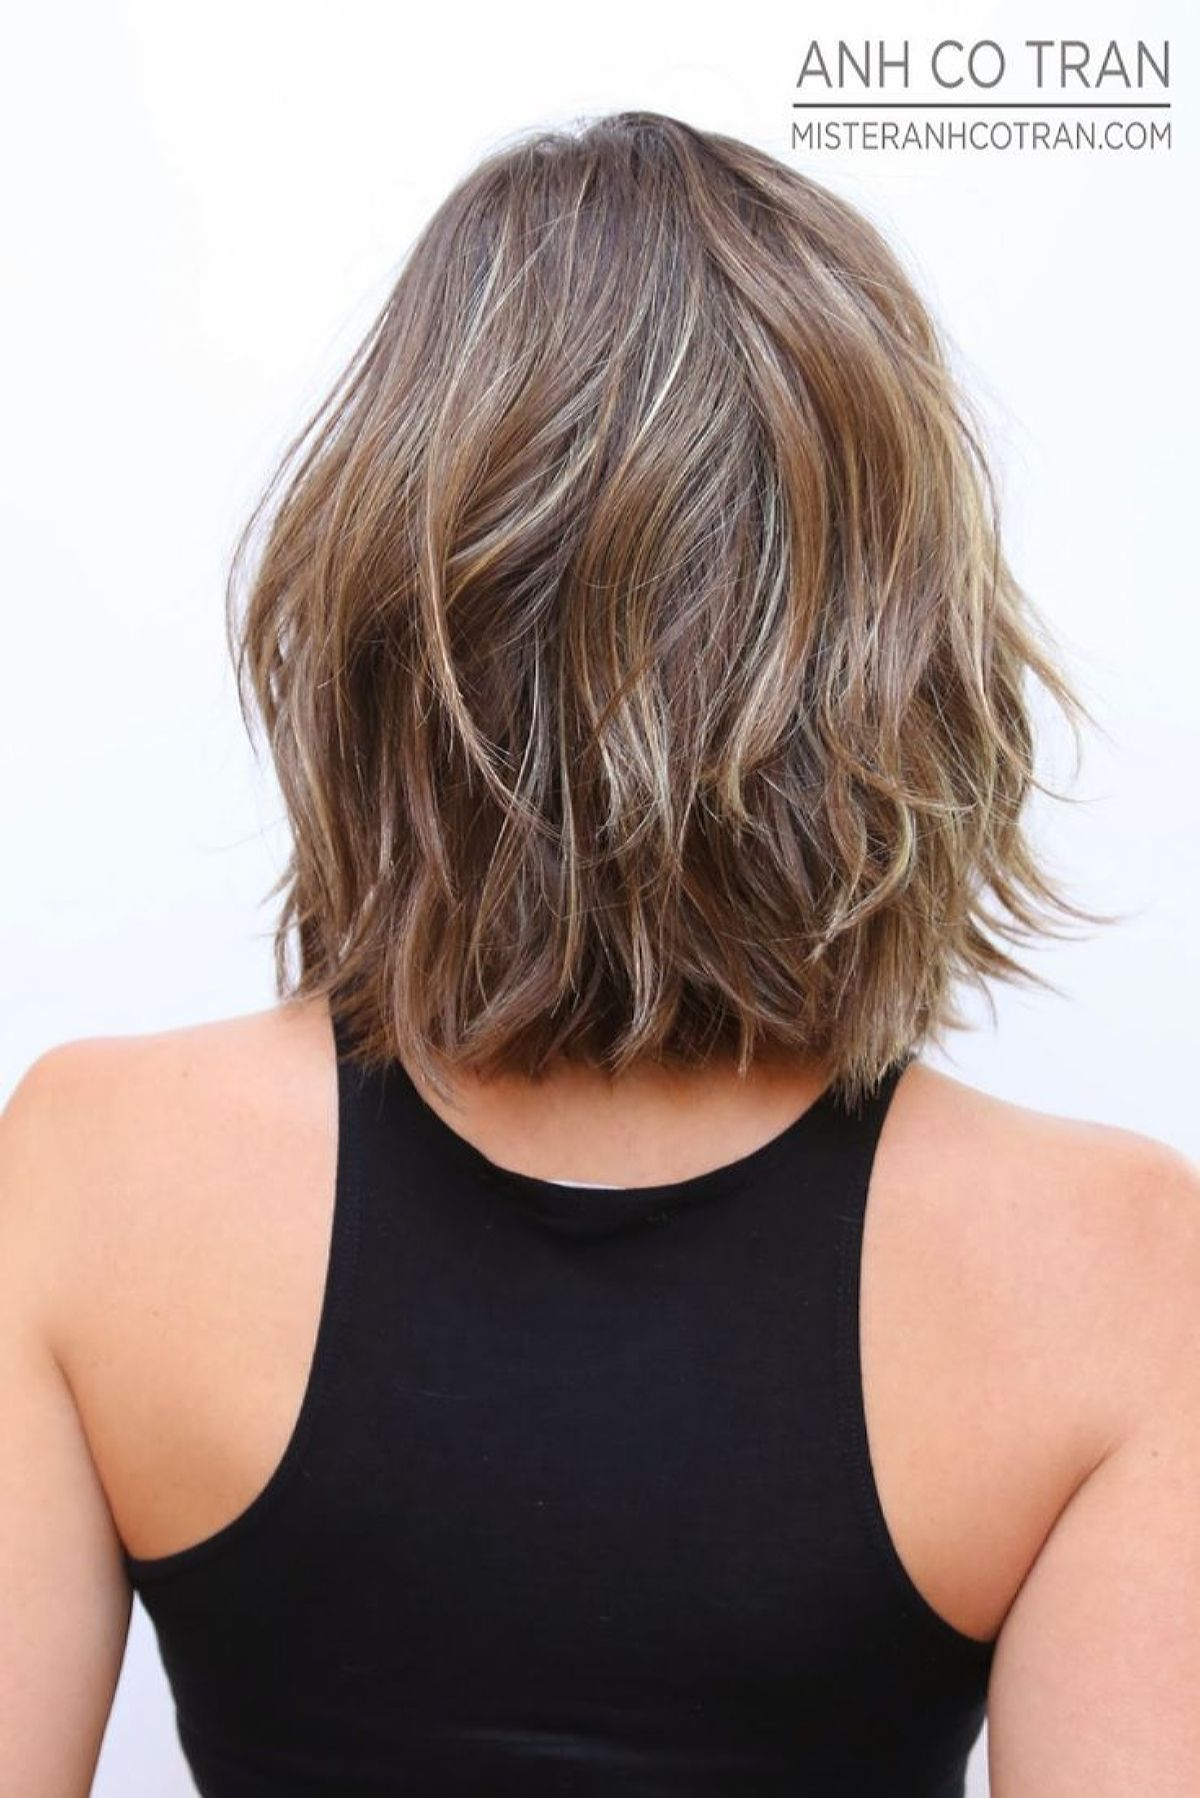 Frisur glatze hinterkopf